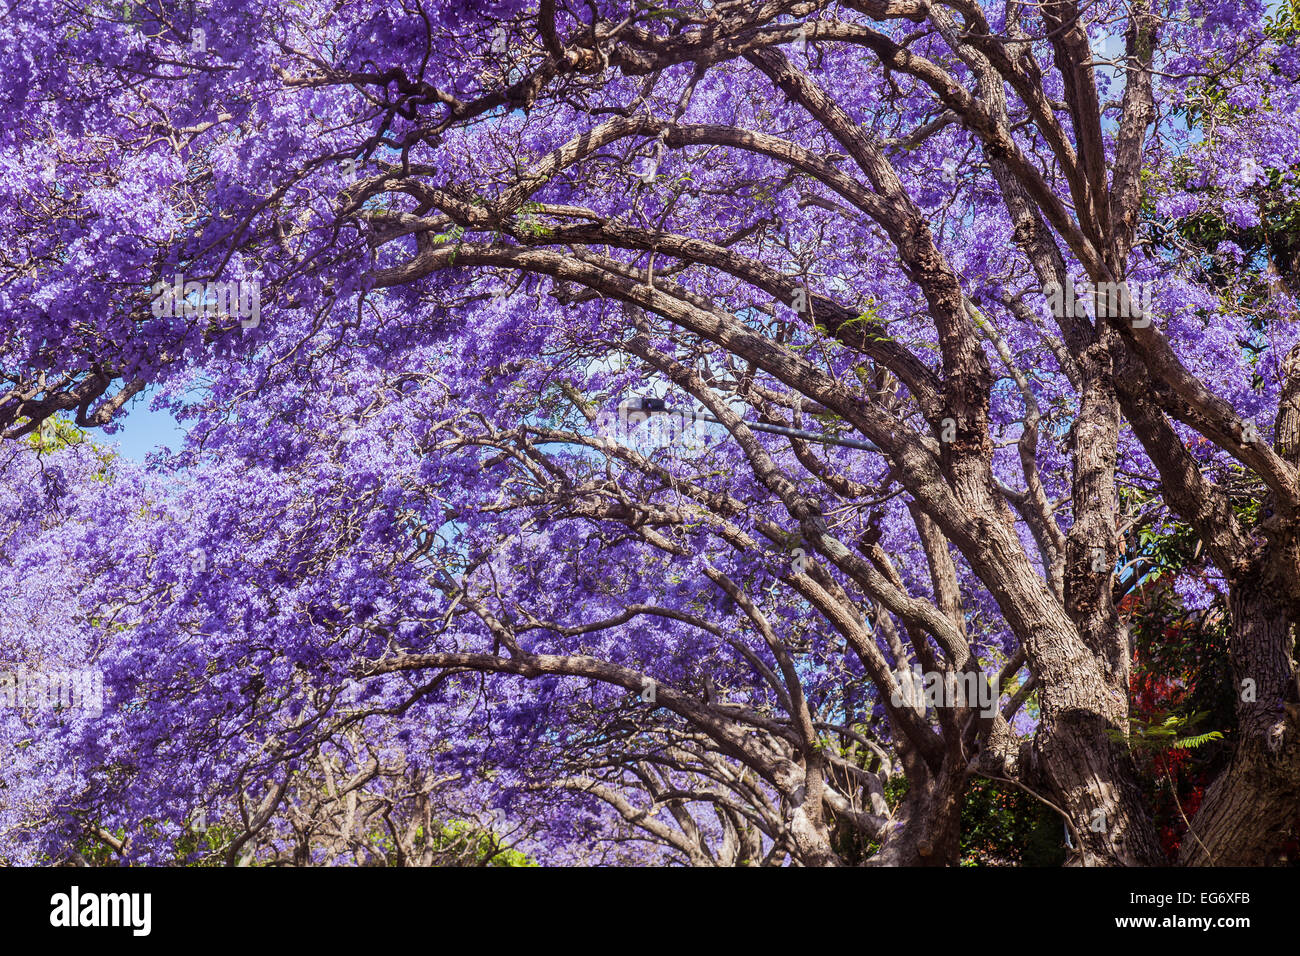 Jacaranda trees in full blossom in a residential street in Kirribilli, Sydney. - Stock Image